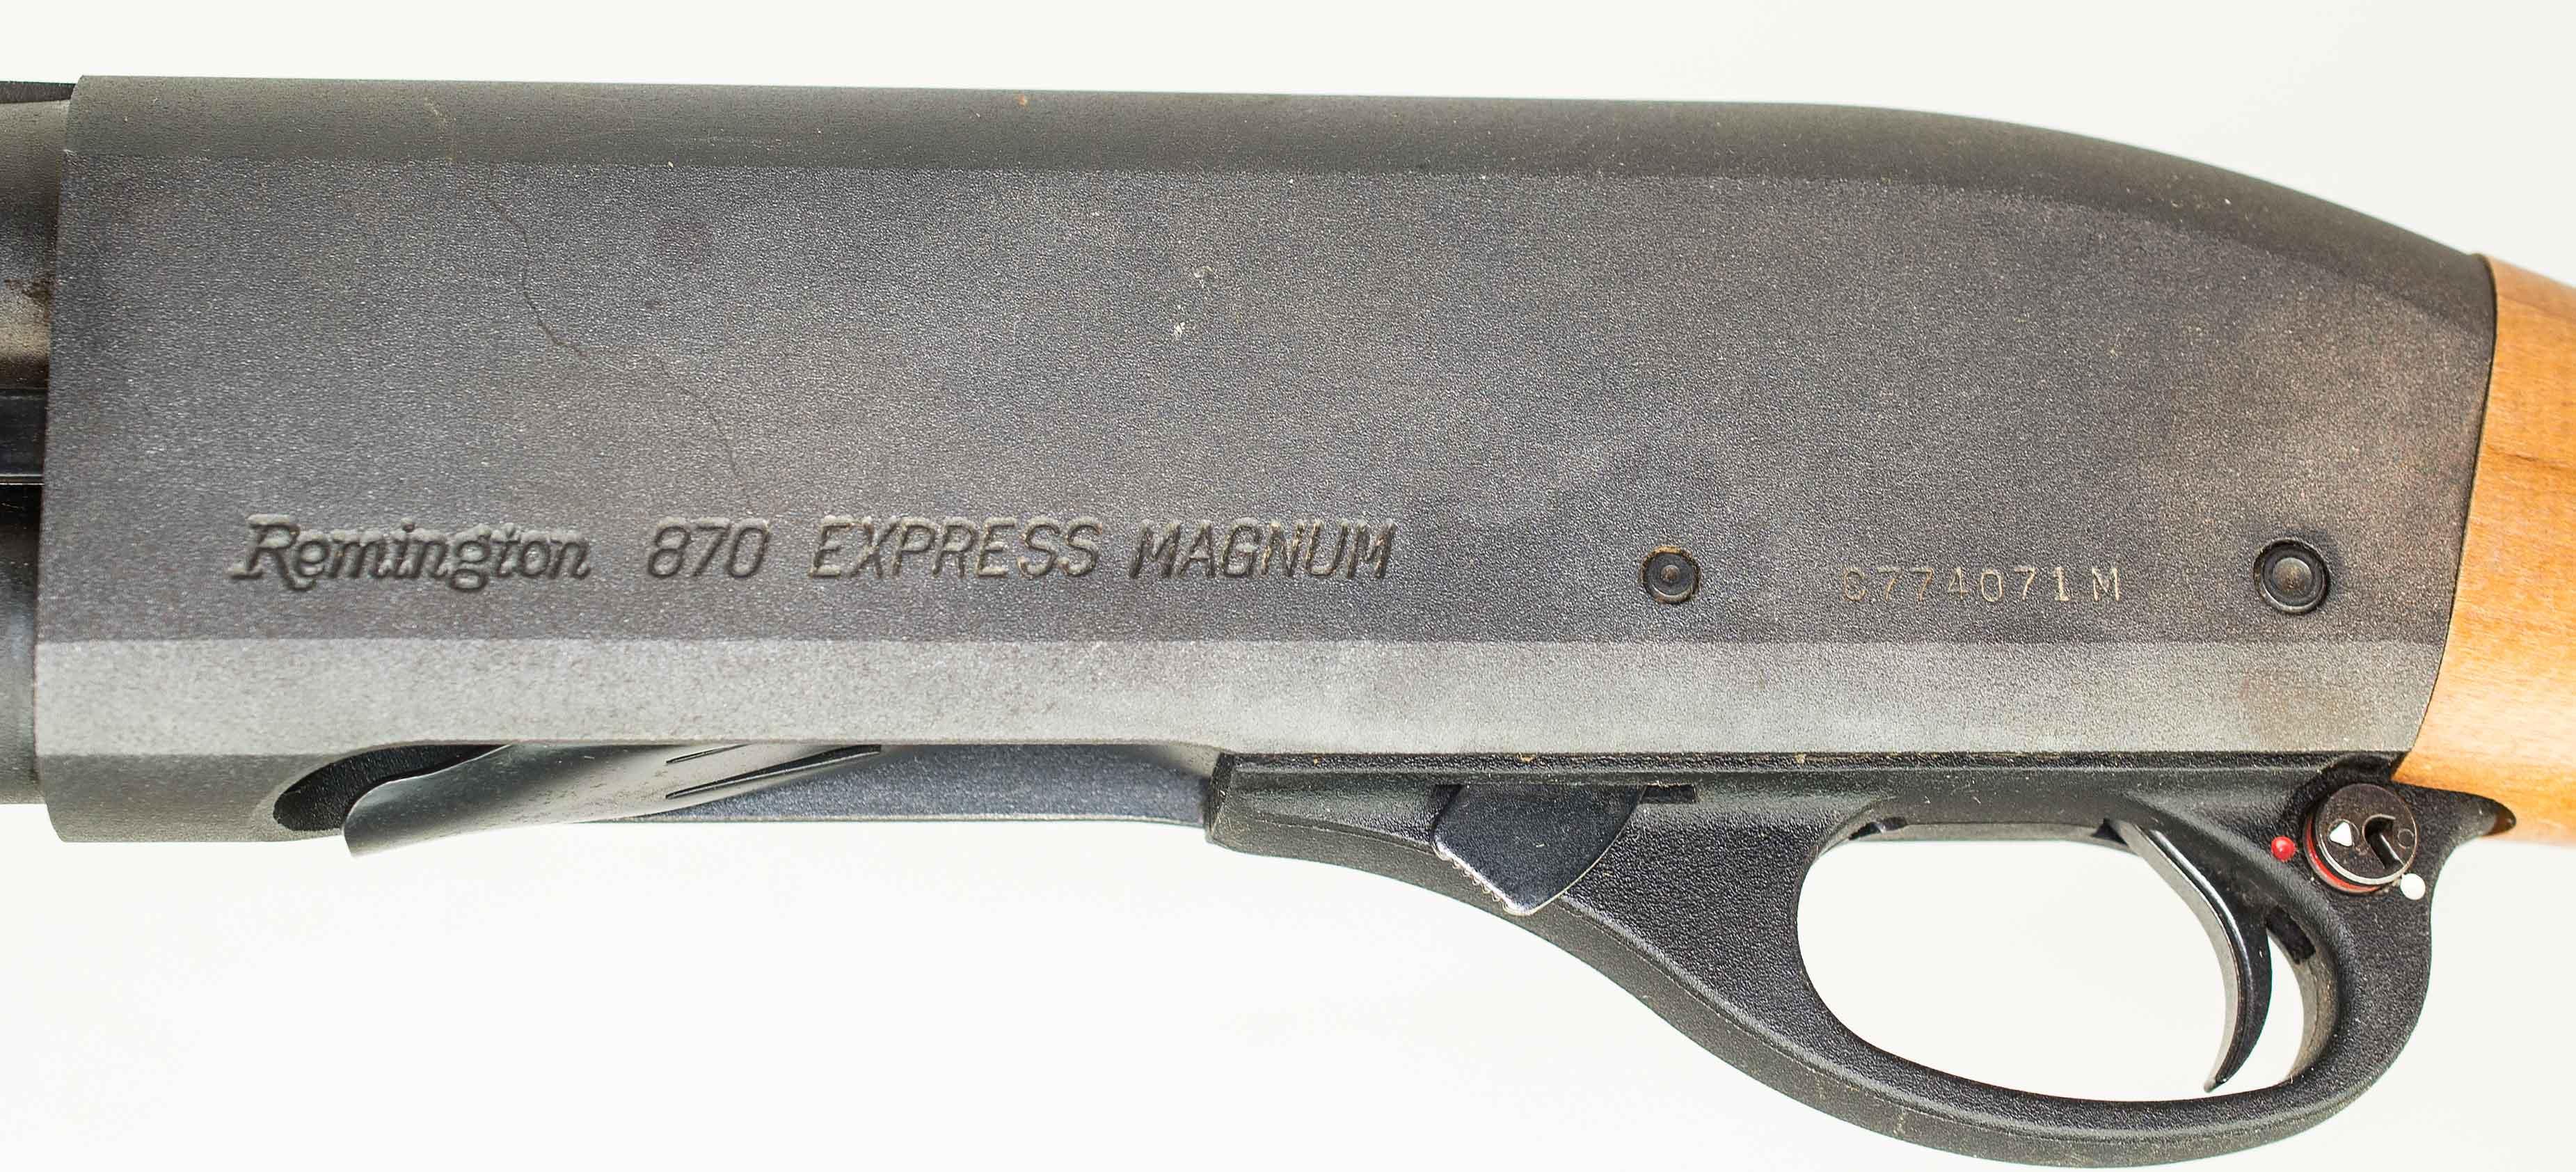 remington 870 express magnum auction id 10001014 end time nov